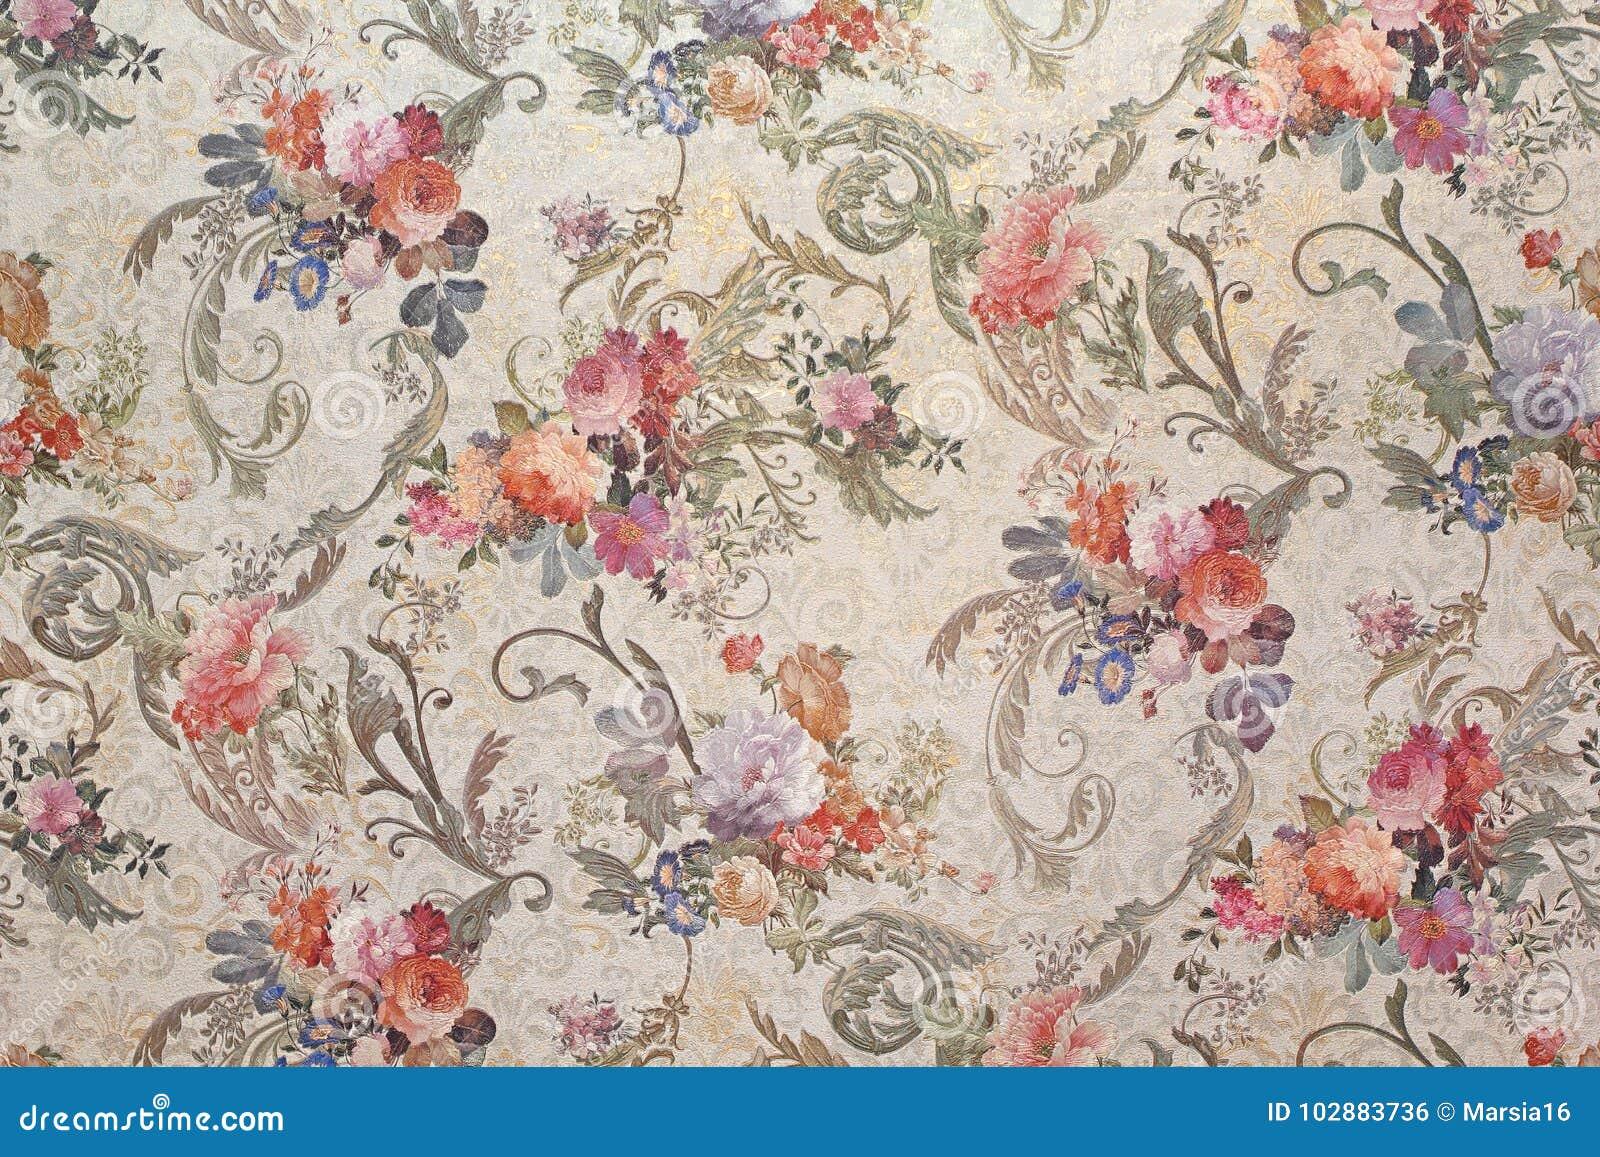 Pink Red Roses Vintage Floral Wallpaper Murals Wallpaper